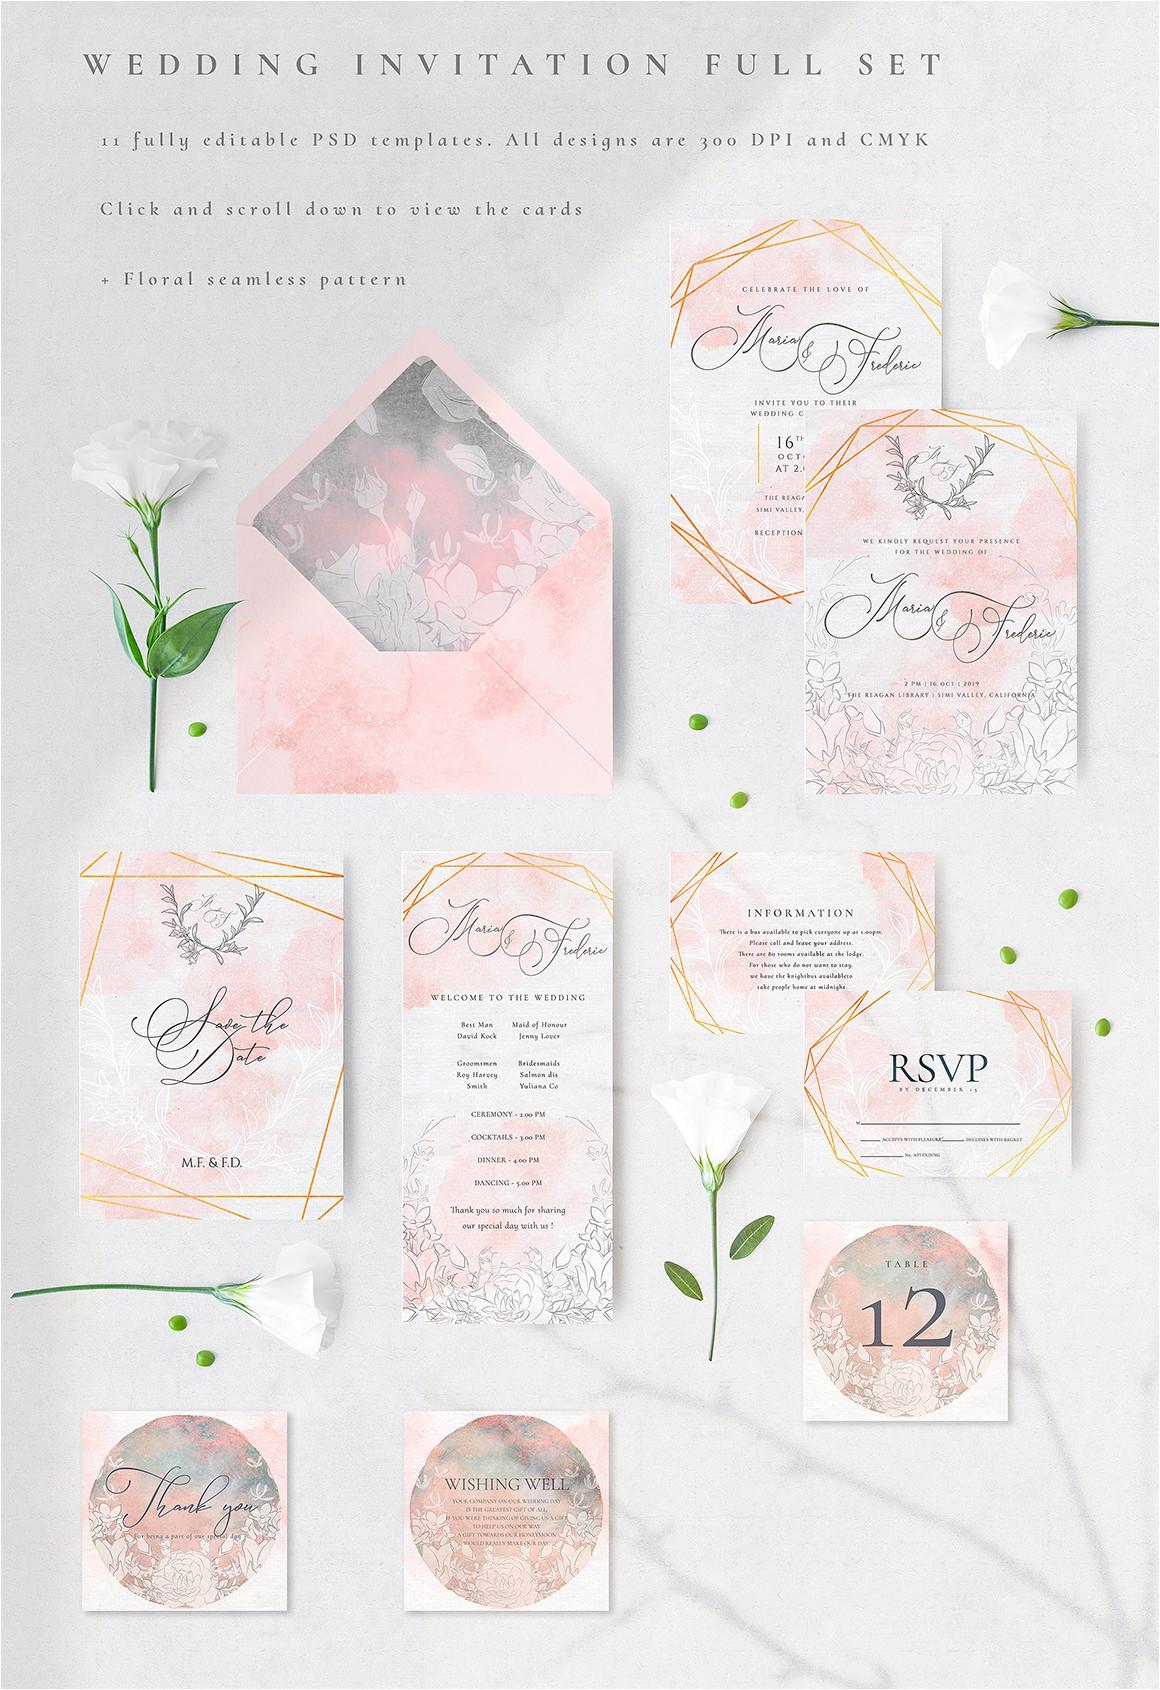 wedding invitation cards full set